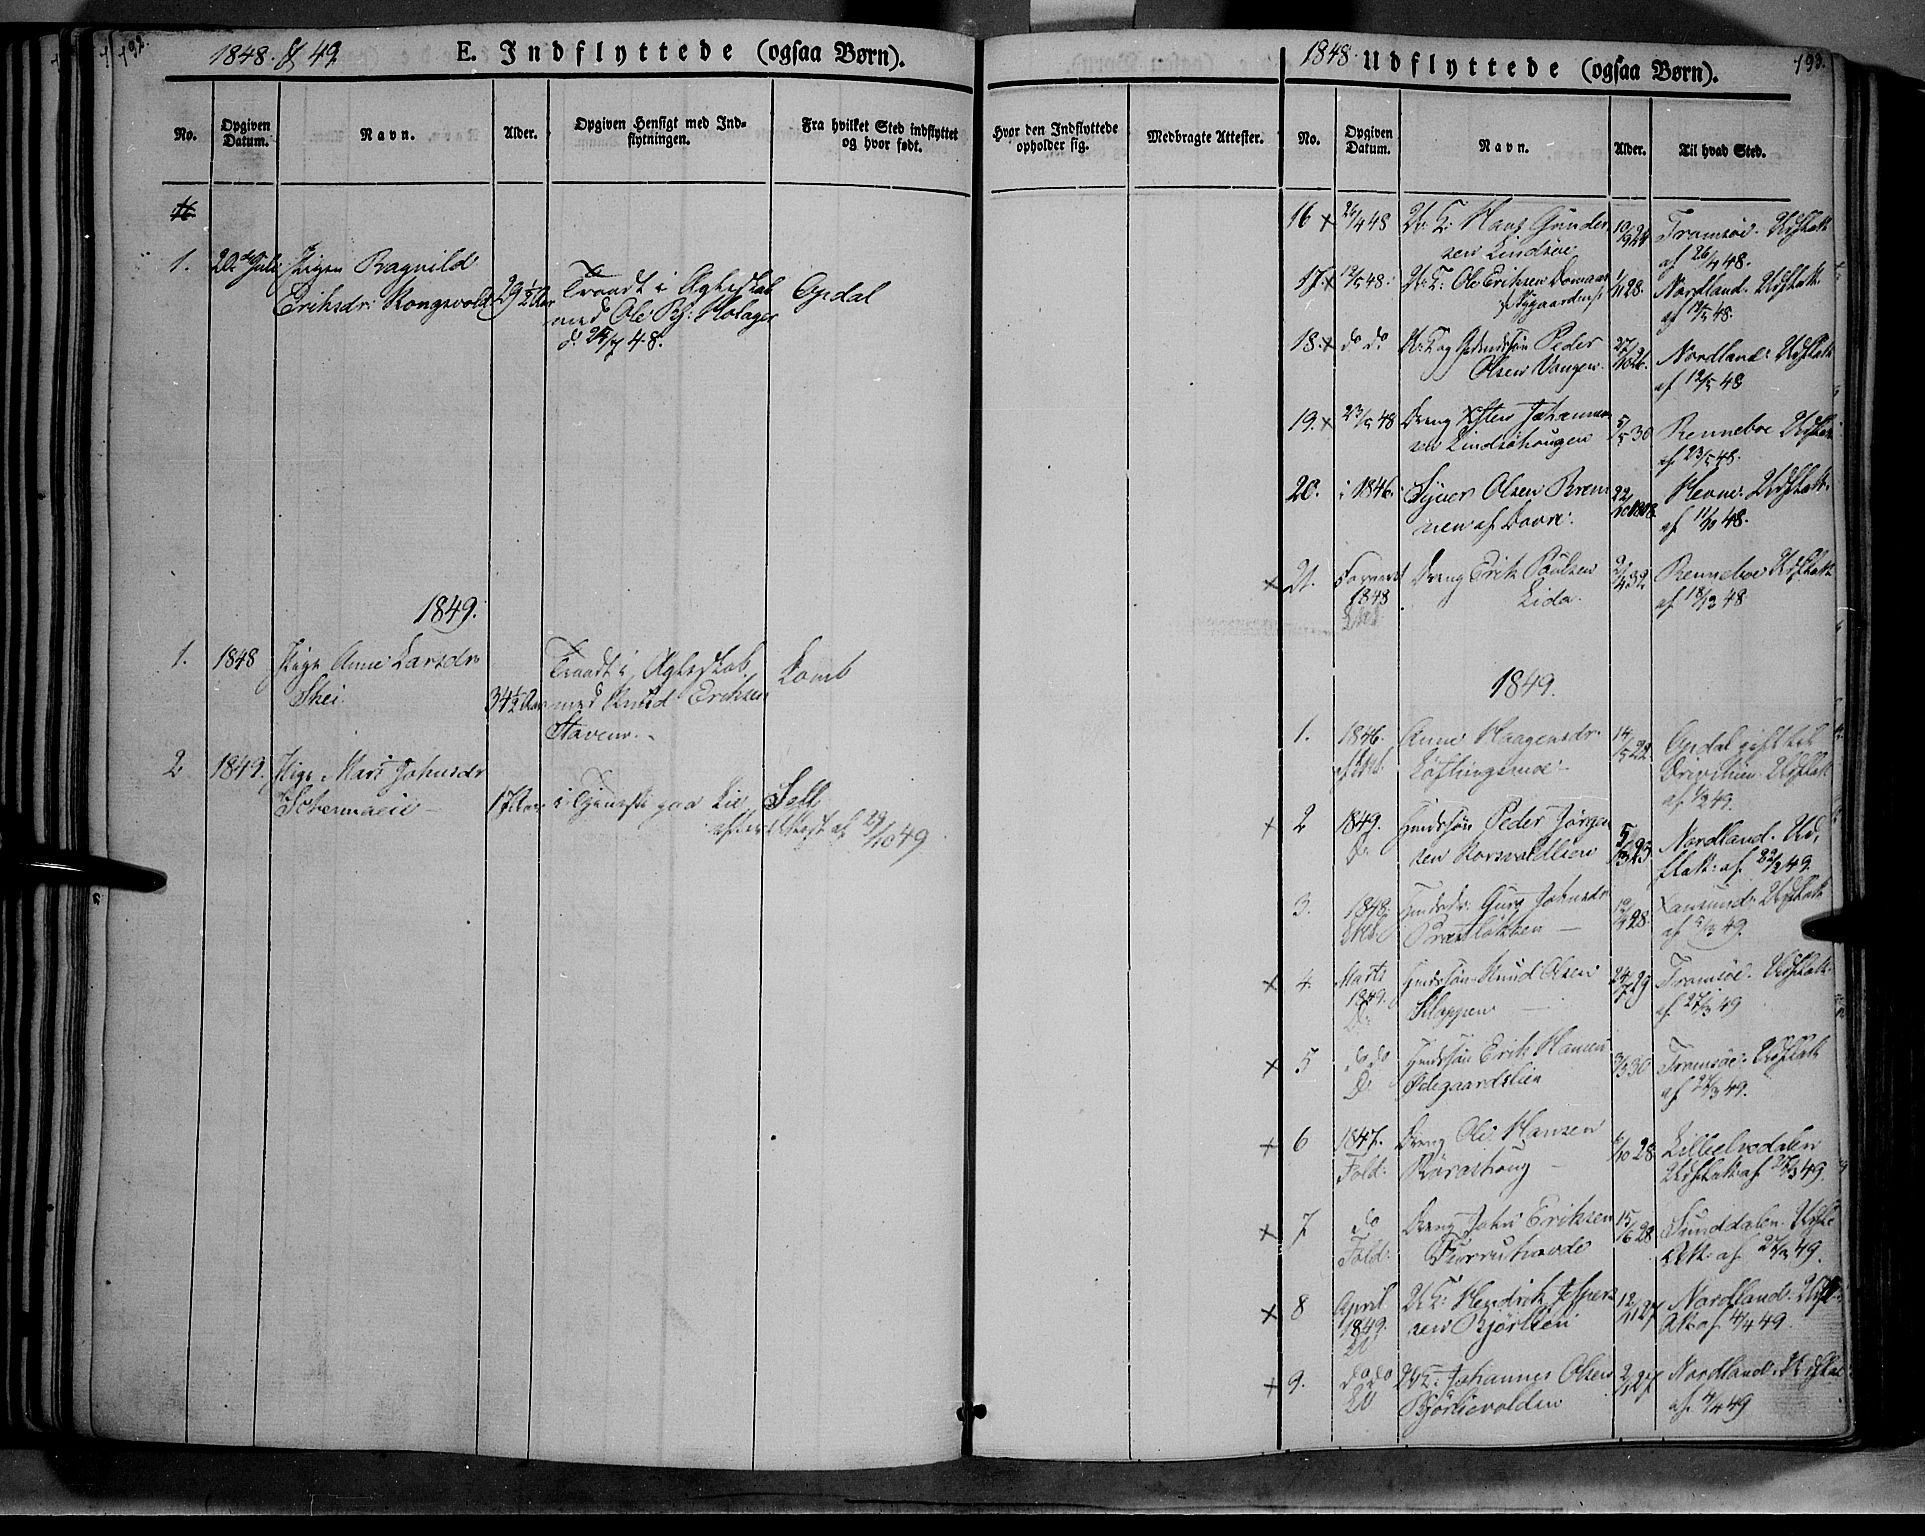 SAH, Lesja prestekontor, Ministerialbok nr. 6B, 1843-1854, s. 792-793